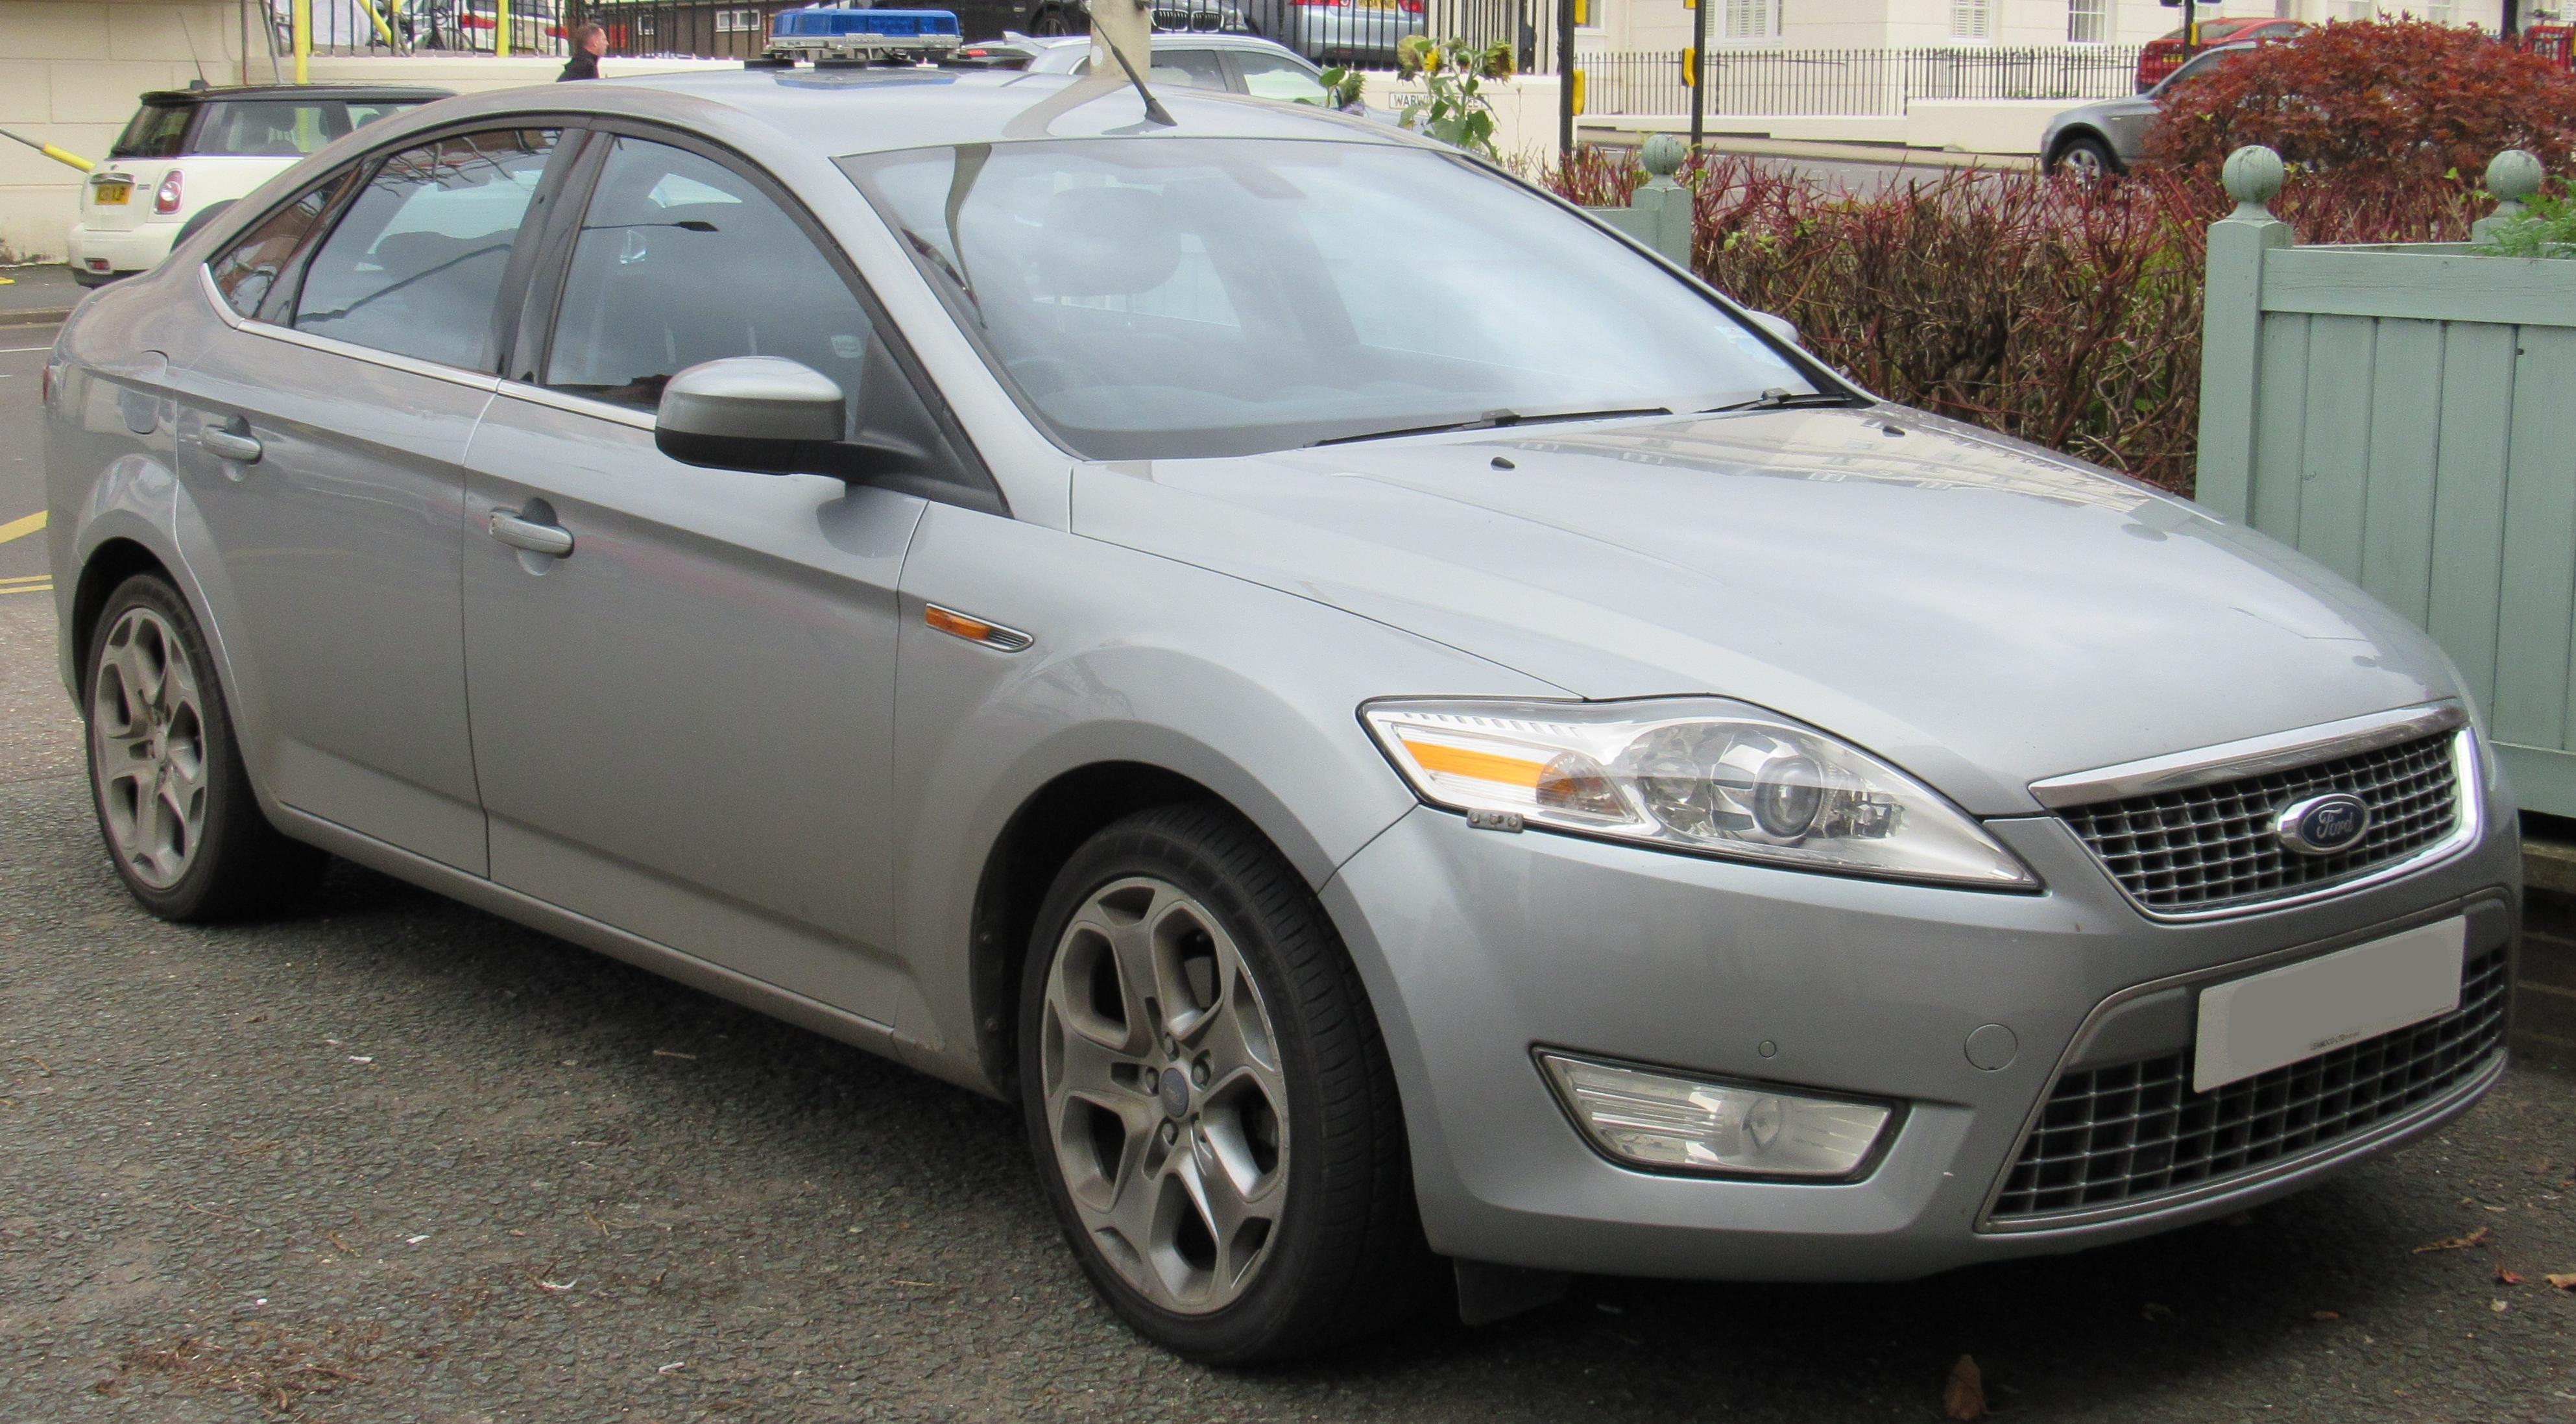 2009 Ford Mondeo Titanium X IV